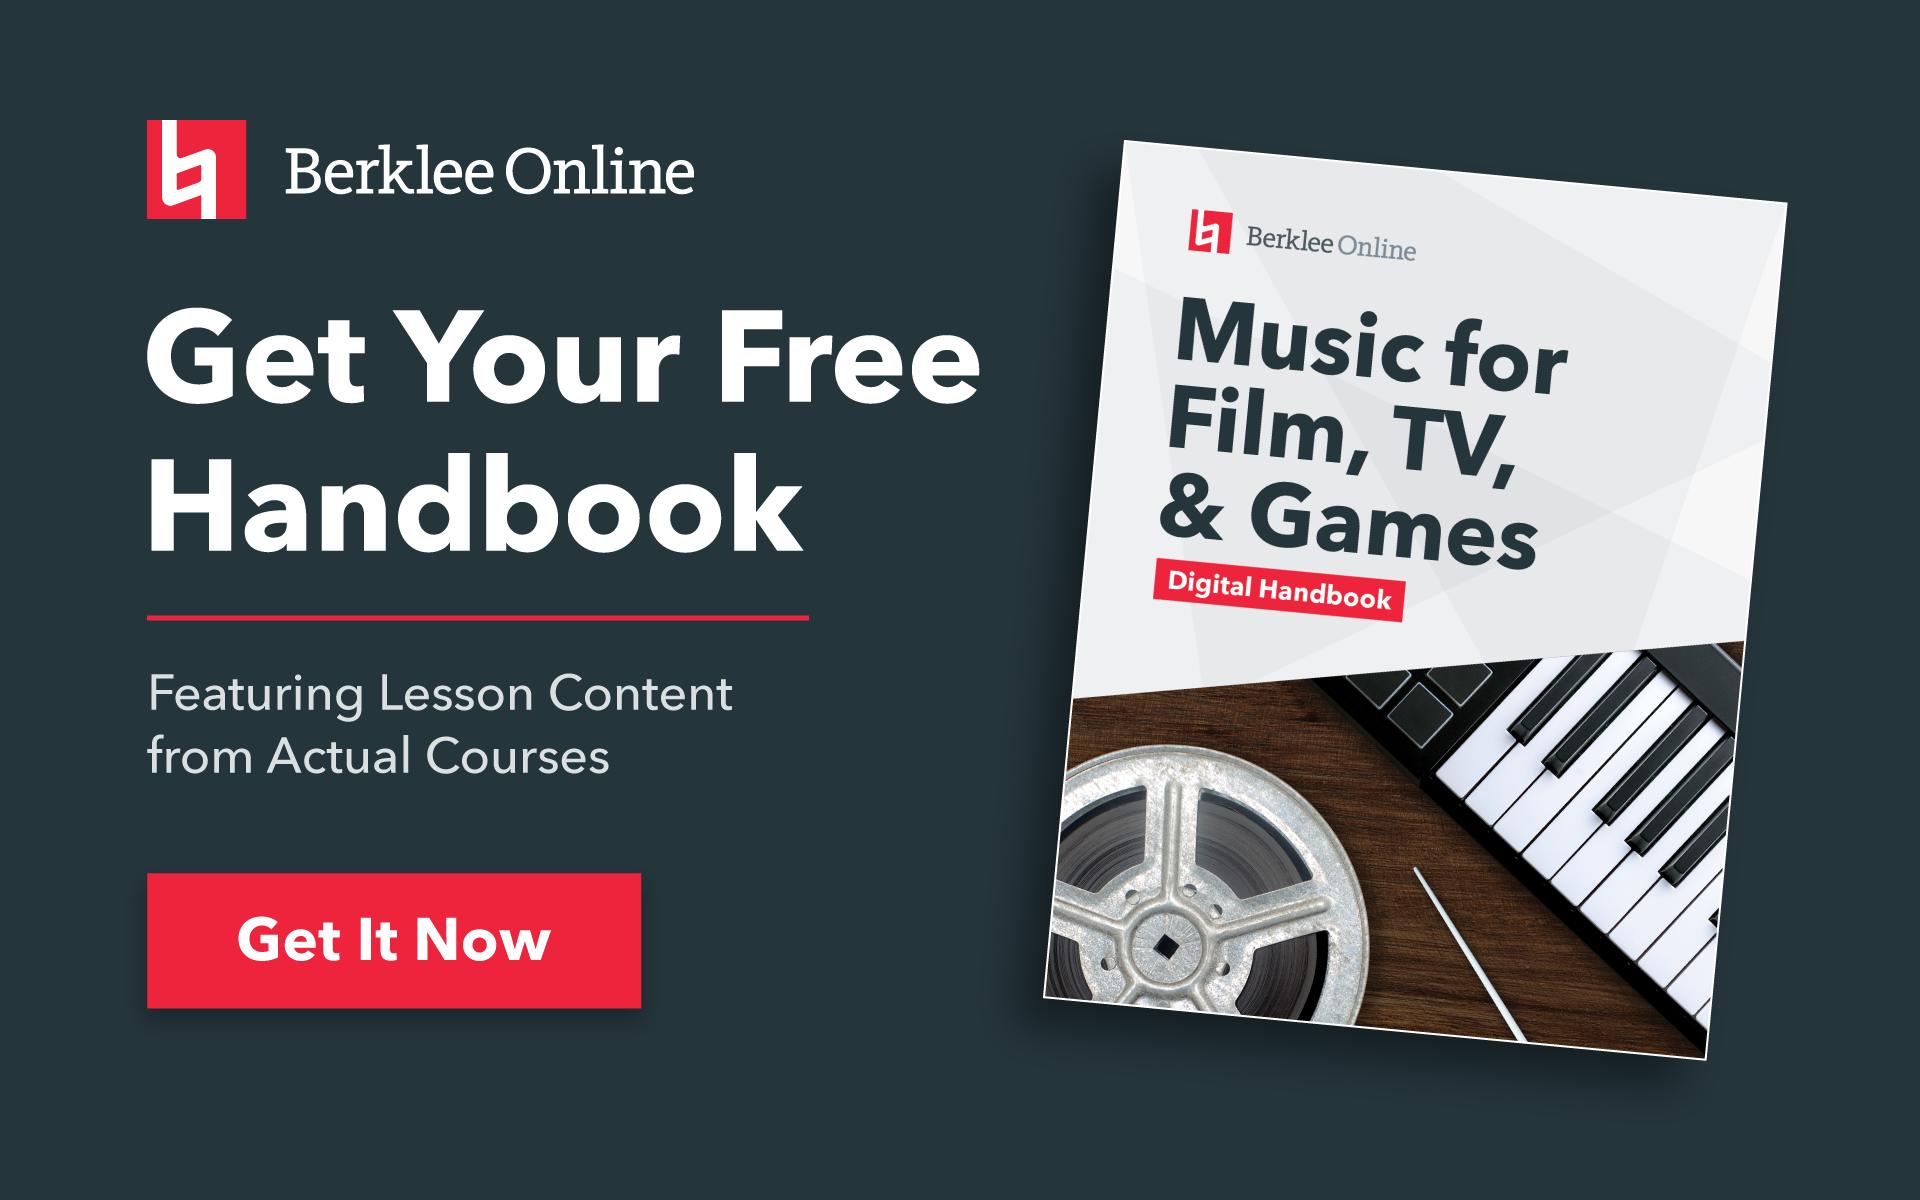 Get your free Scoring for Film, TV, and Games handbook from Berklee Online.